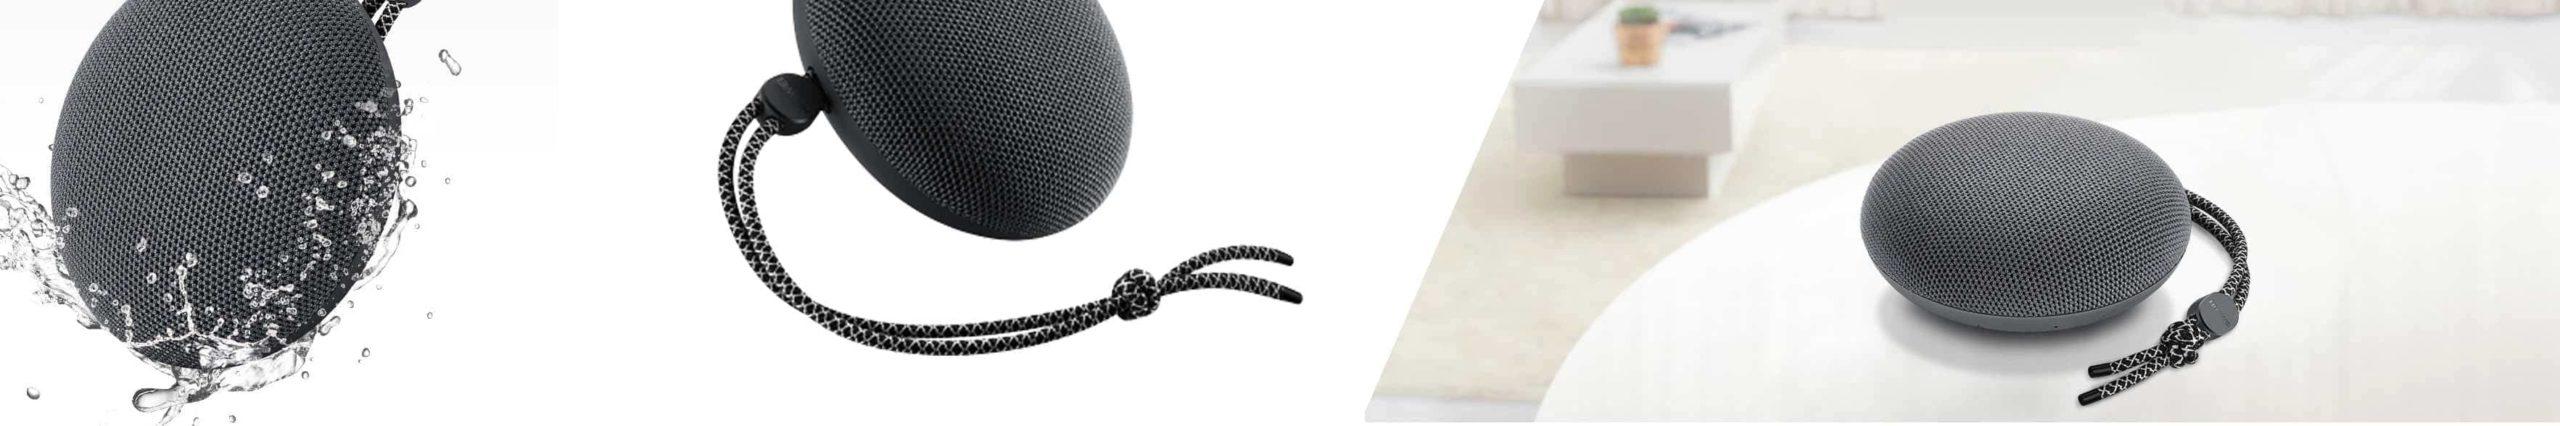 Speaker bluetooth Vendita Online